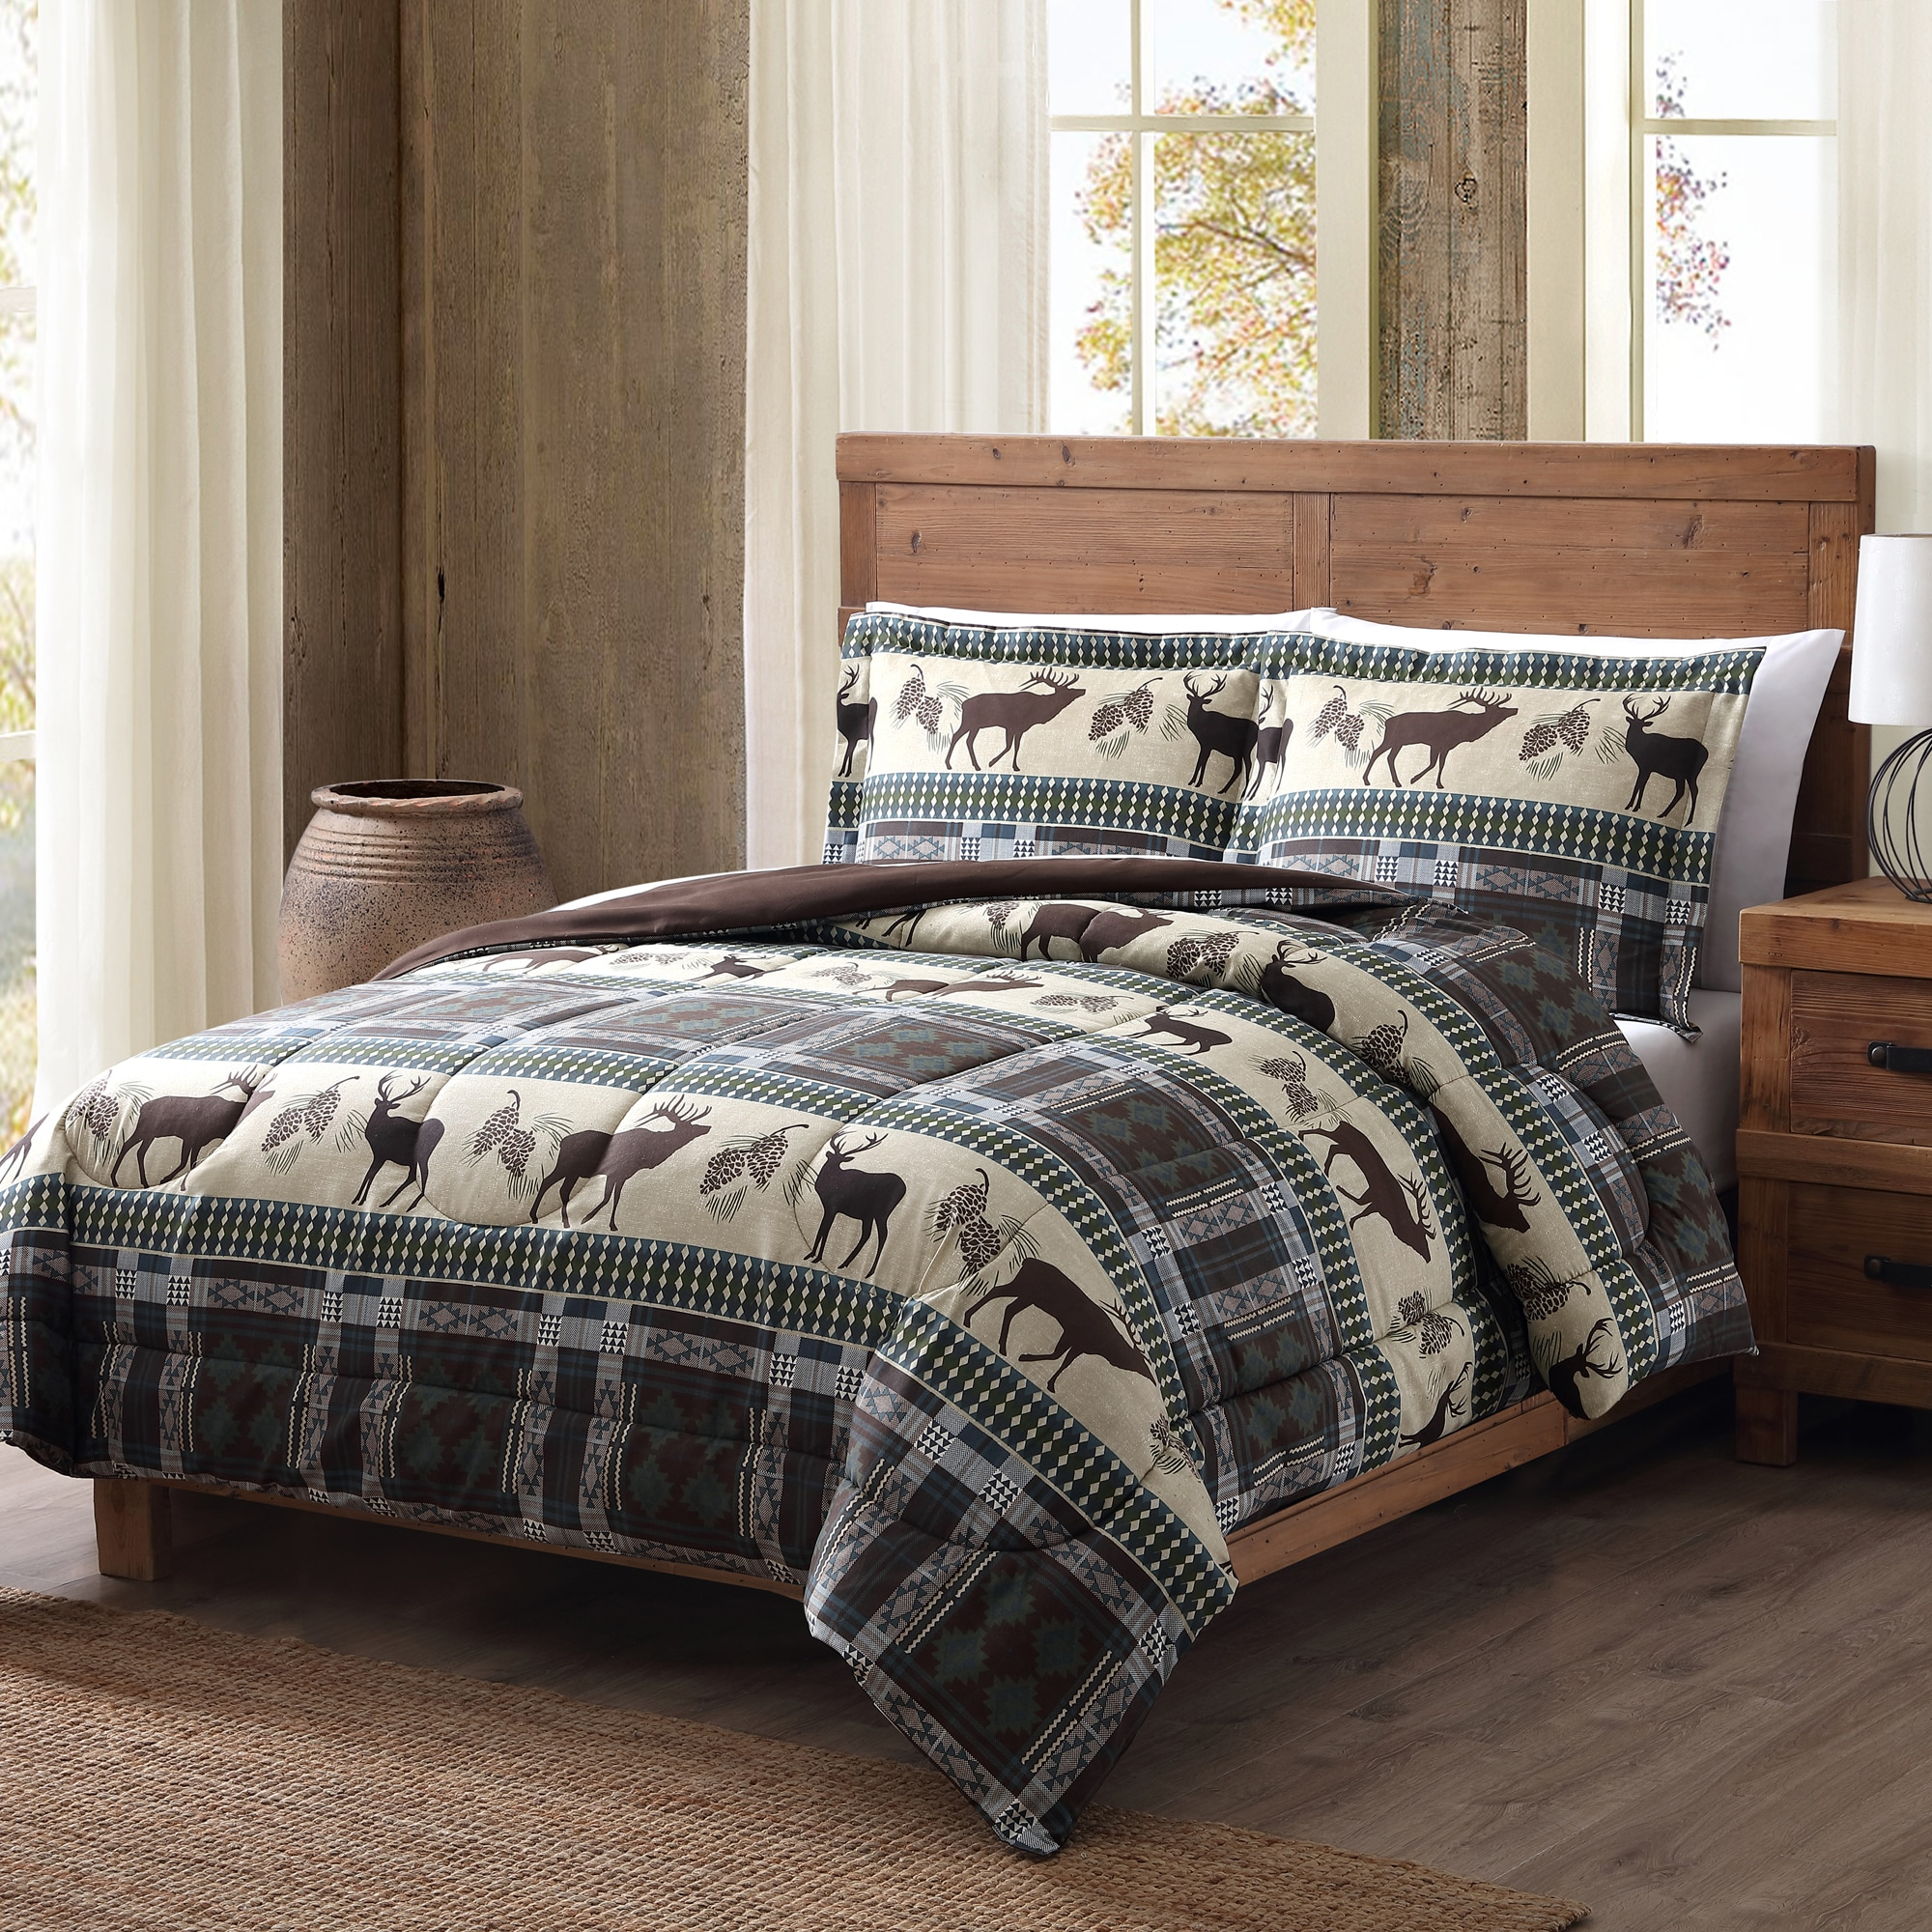 comforter cabins baby bedspreads bedding bed lodge sets onlinechange rustic info cabin sale quilt